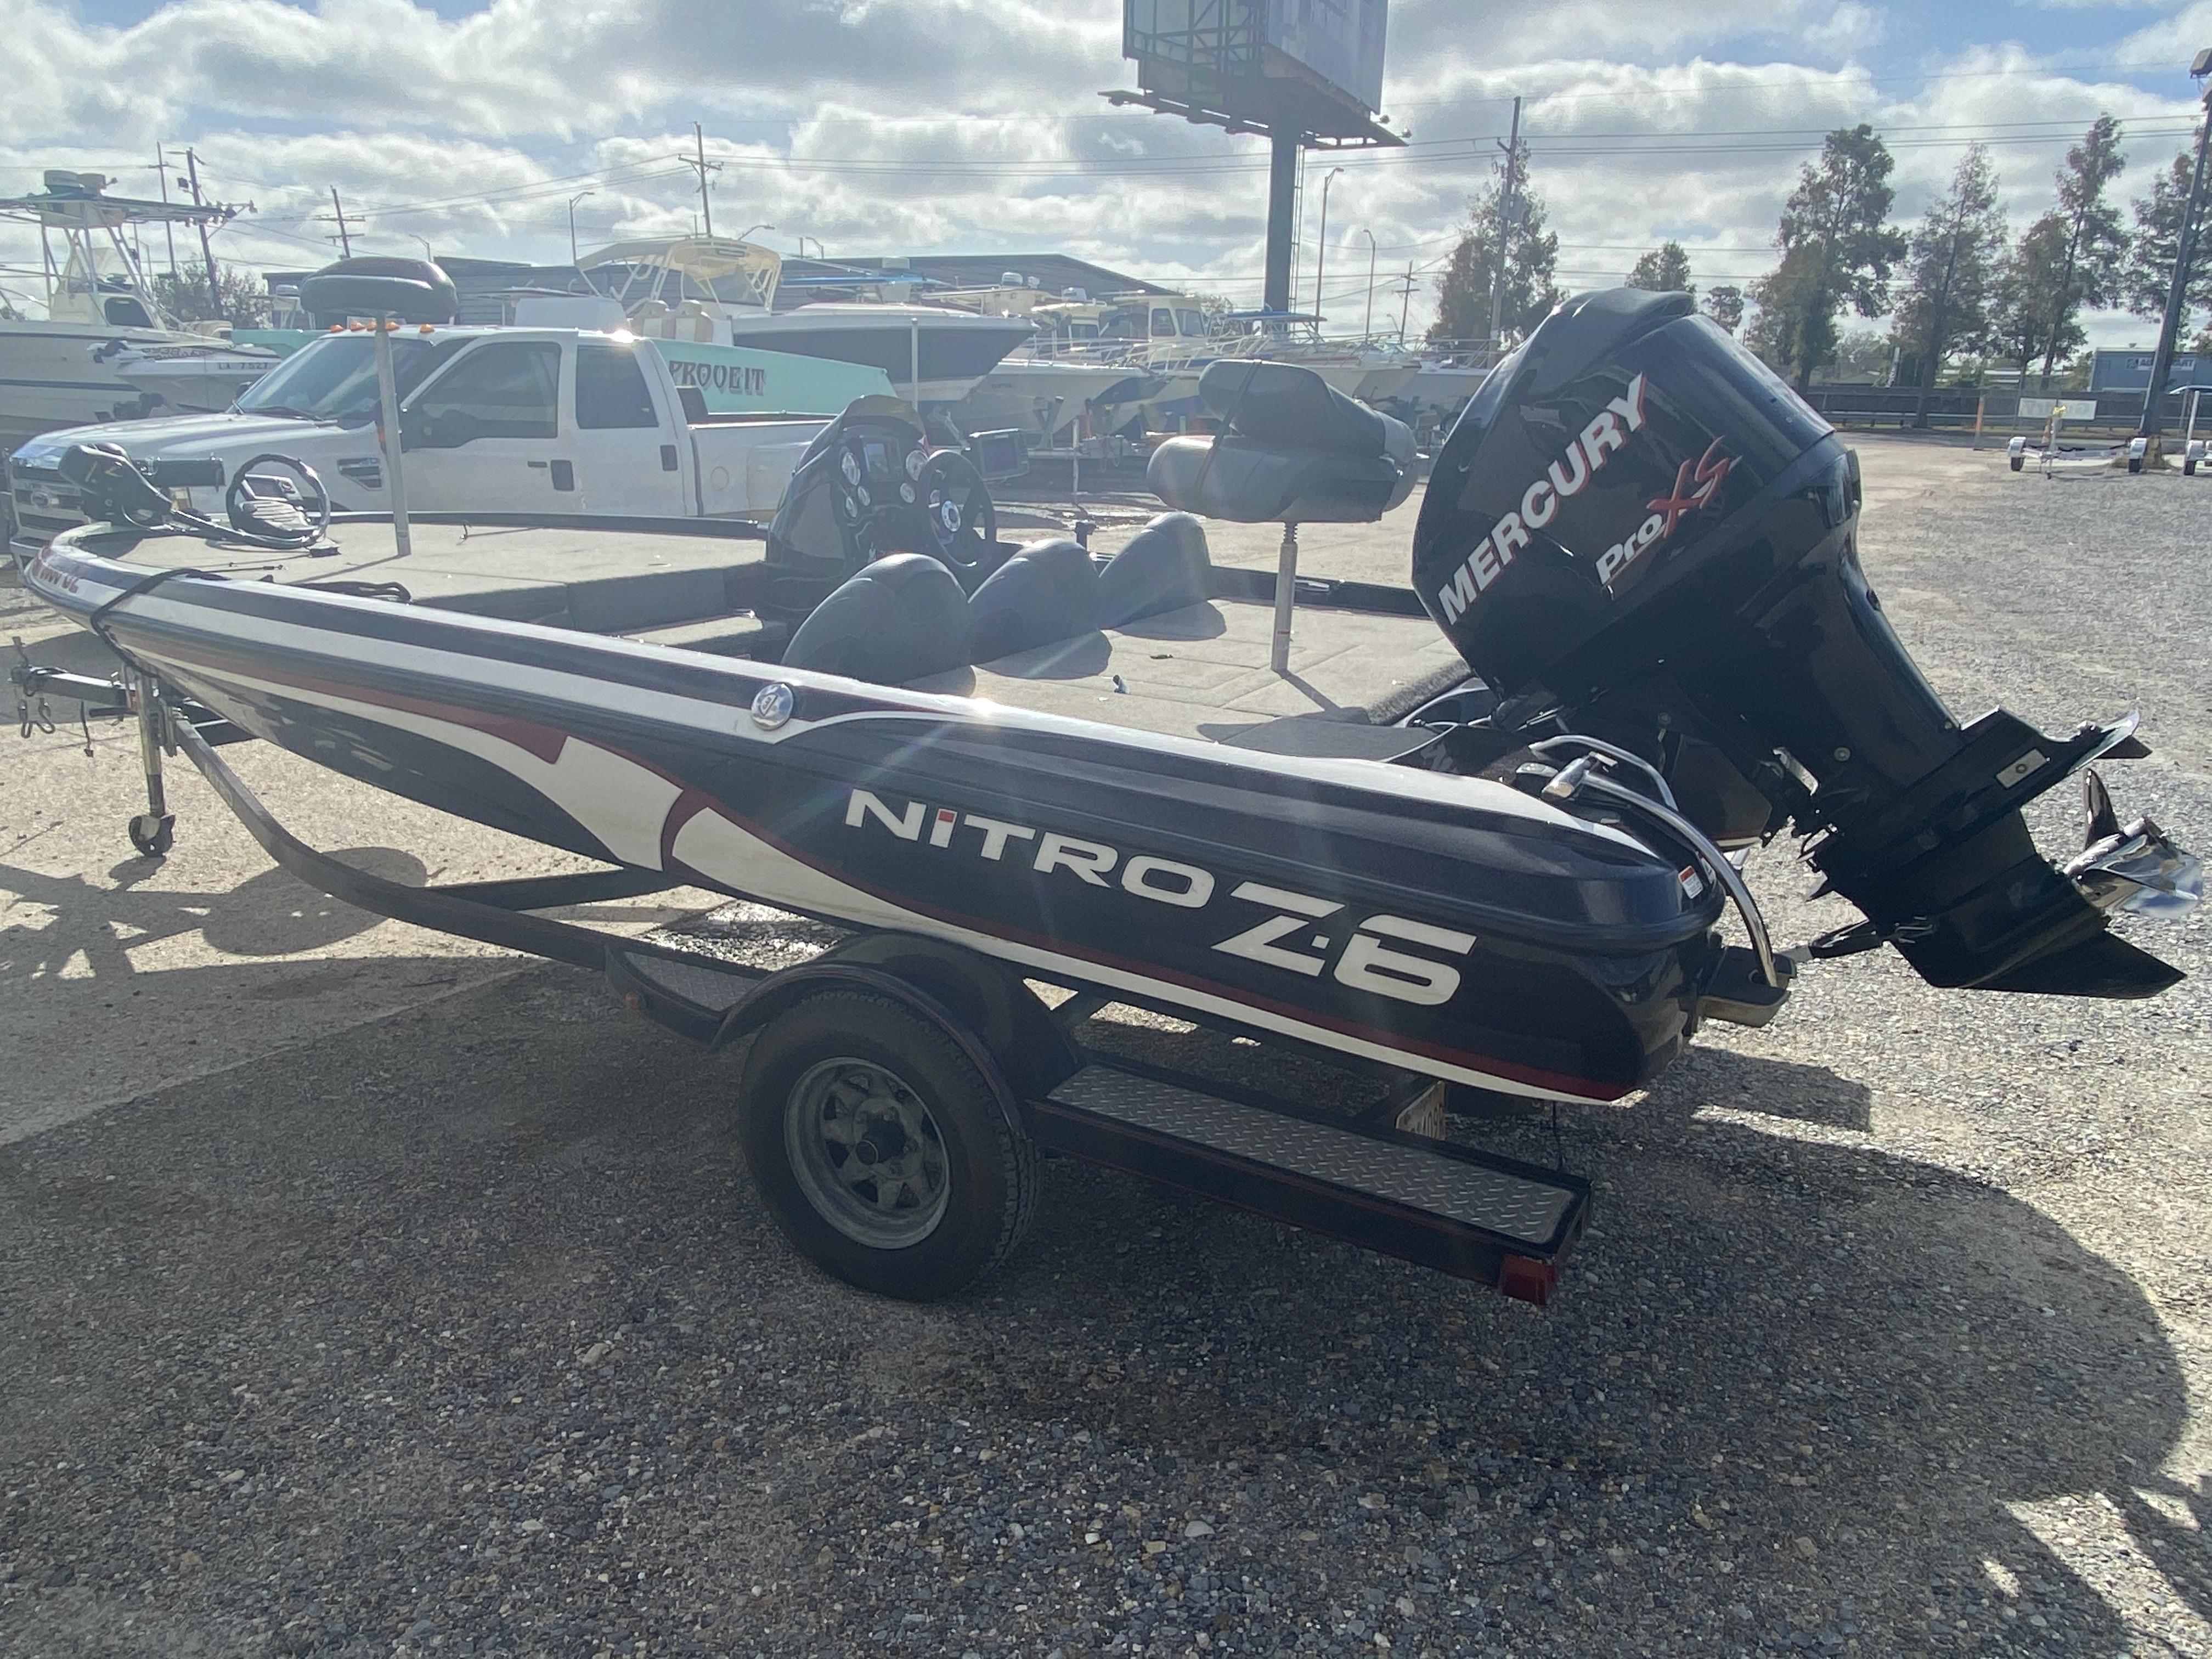 2011 Nitro boat for sale, model of the boat is Z6 & Image # 16 of 18